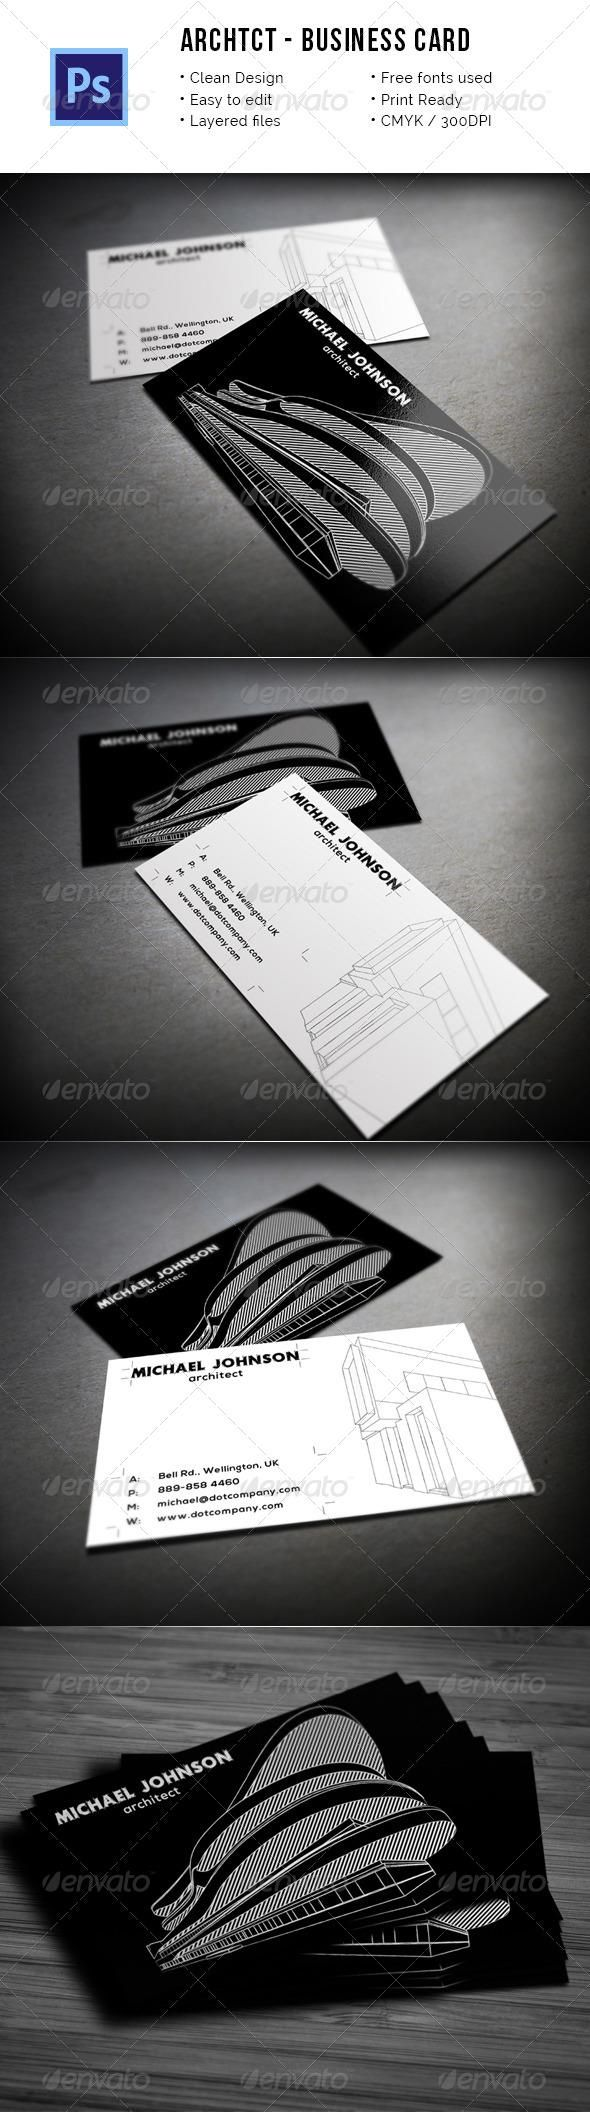 1661 best business card design images on pinterest cards file c archtct architect business card magicingreecefo Images